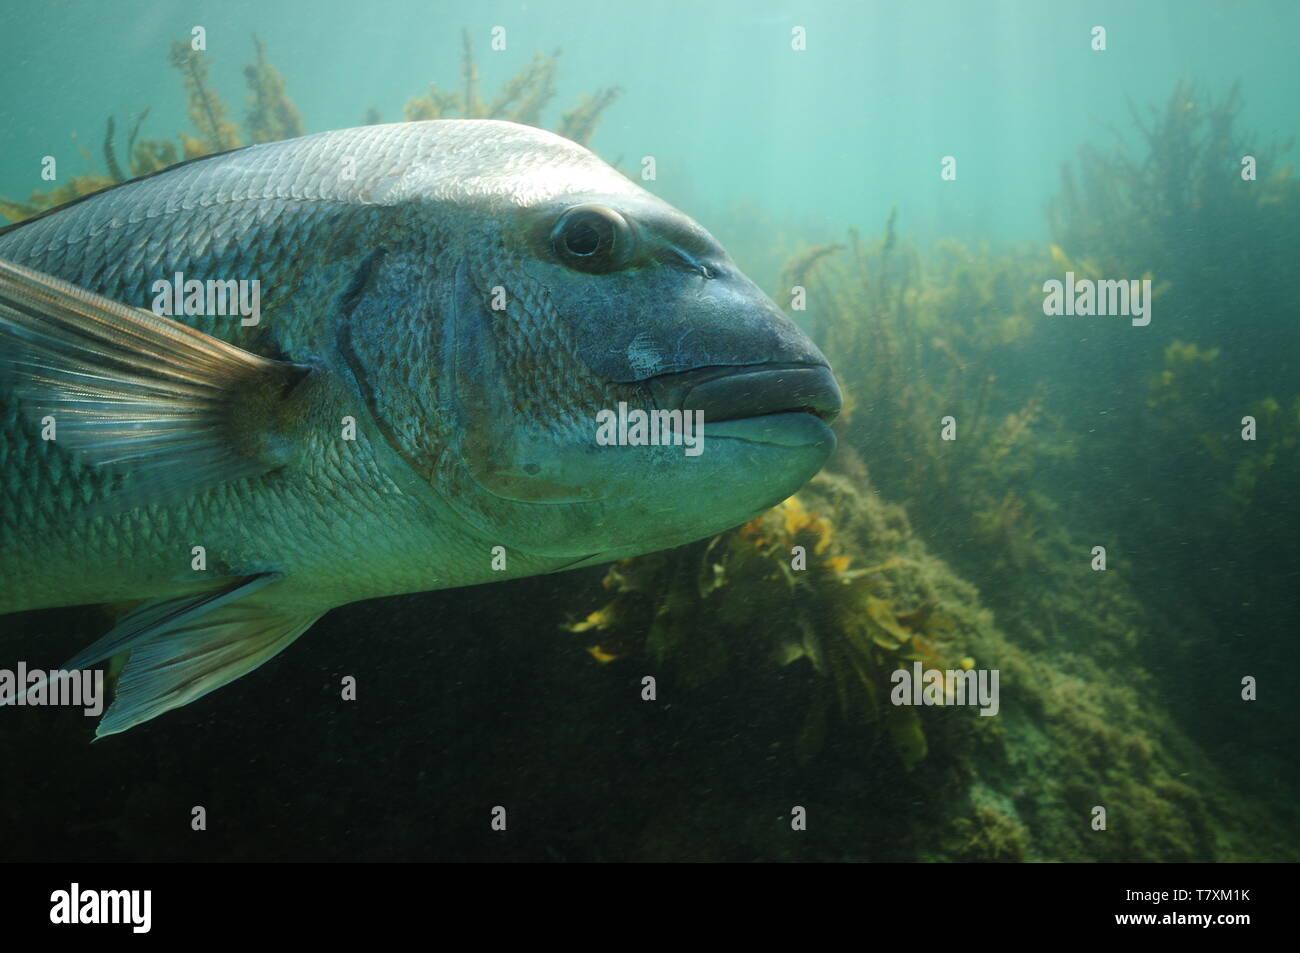 Side detail of large Australasian snapper Pagrus auratus. - Stock Image